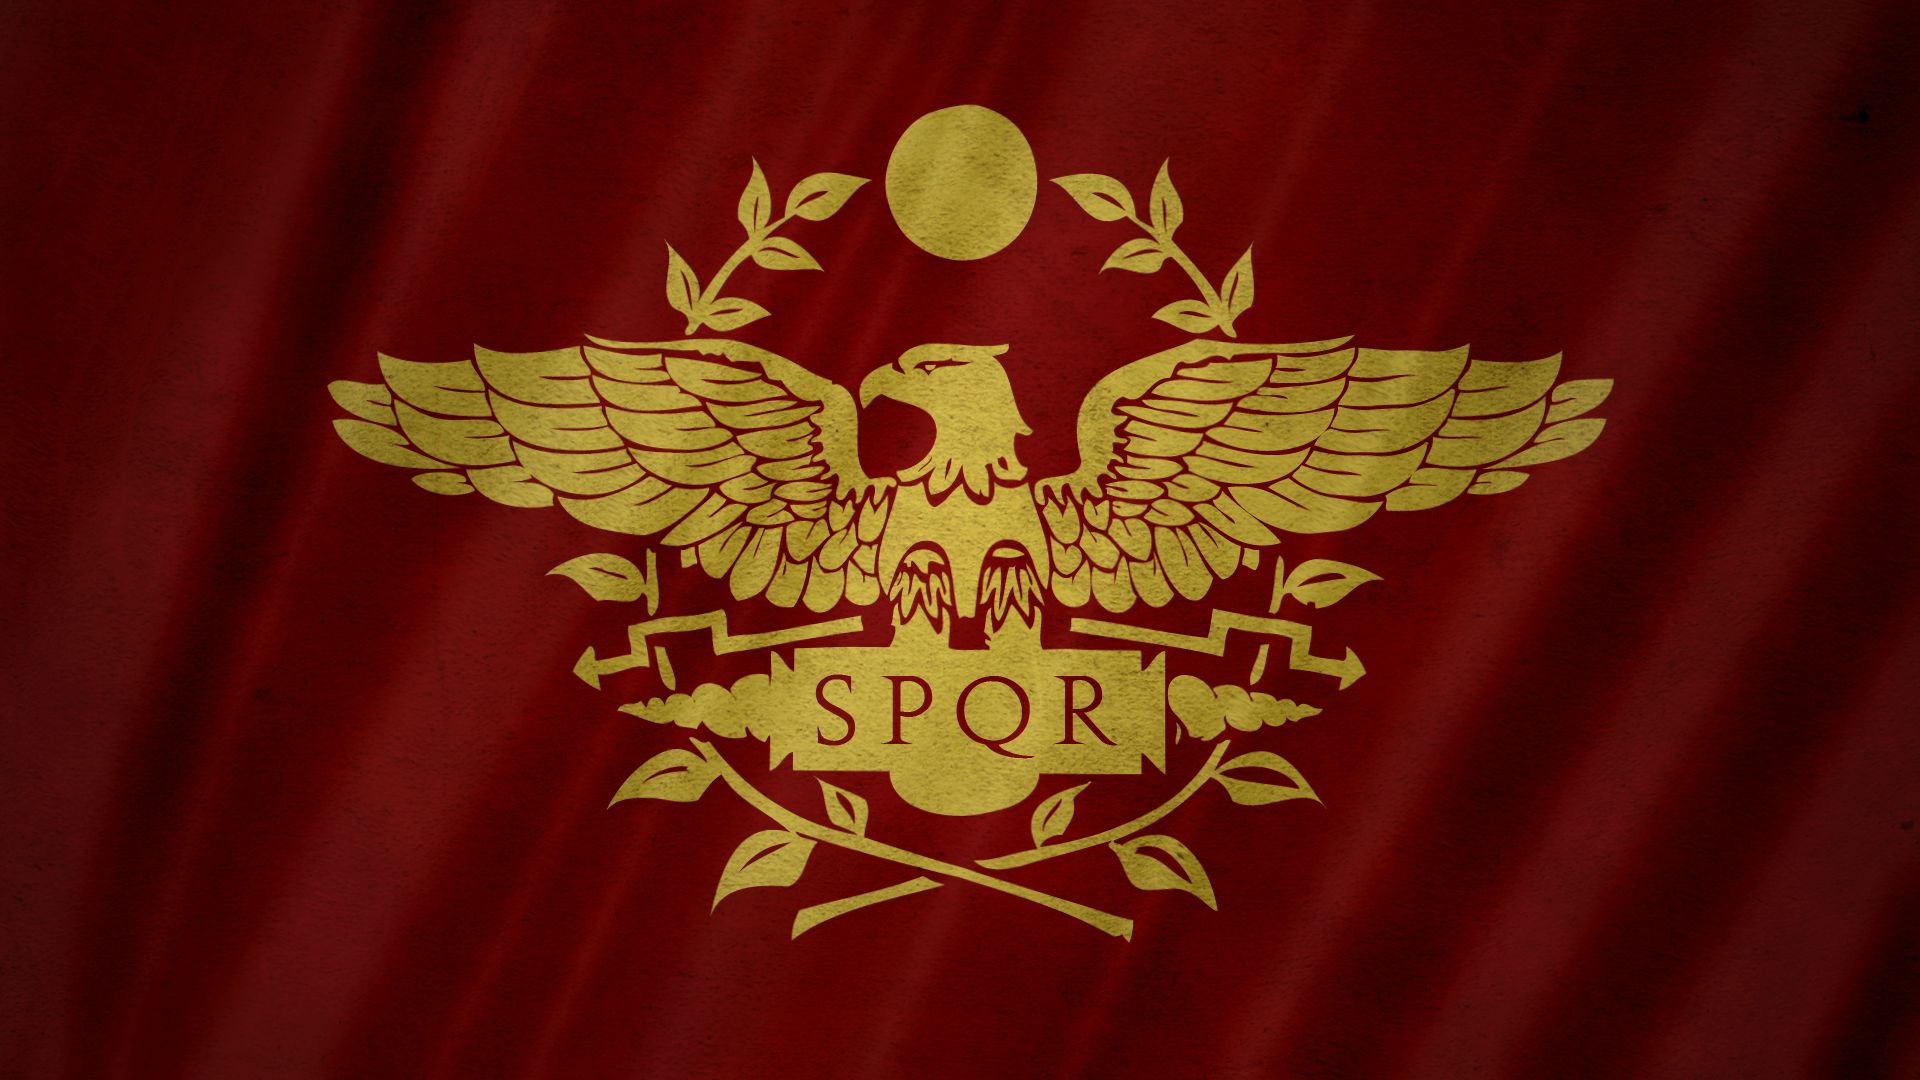 Roman Empire Politics And War Wiki Fandom Powered By Wikia